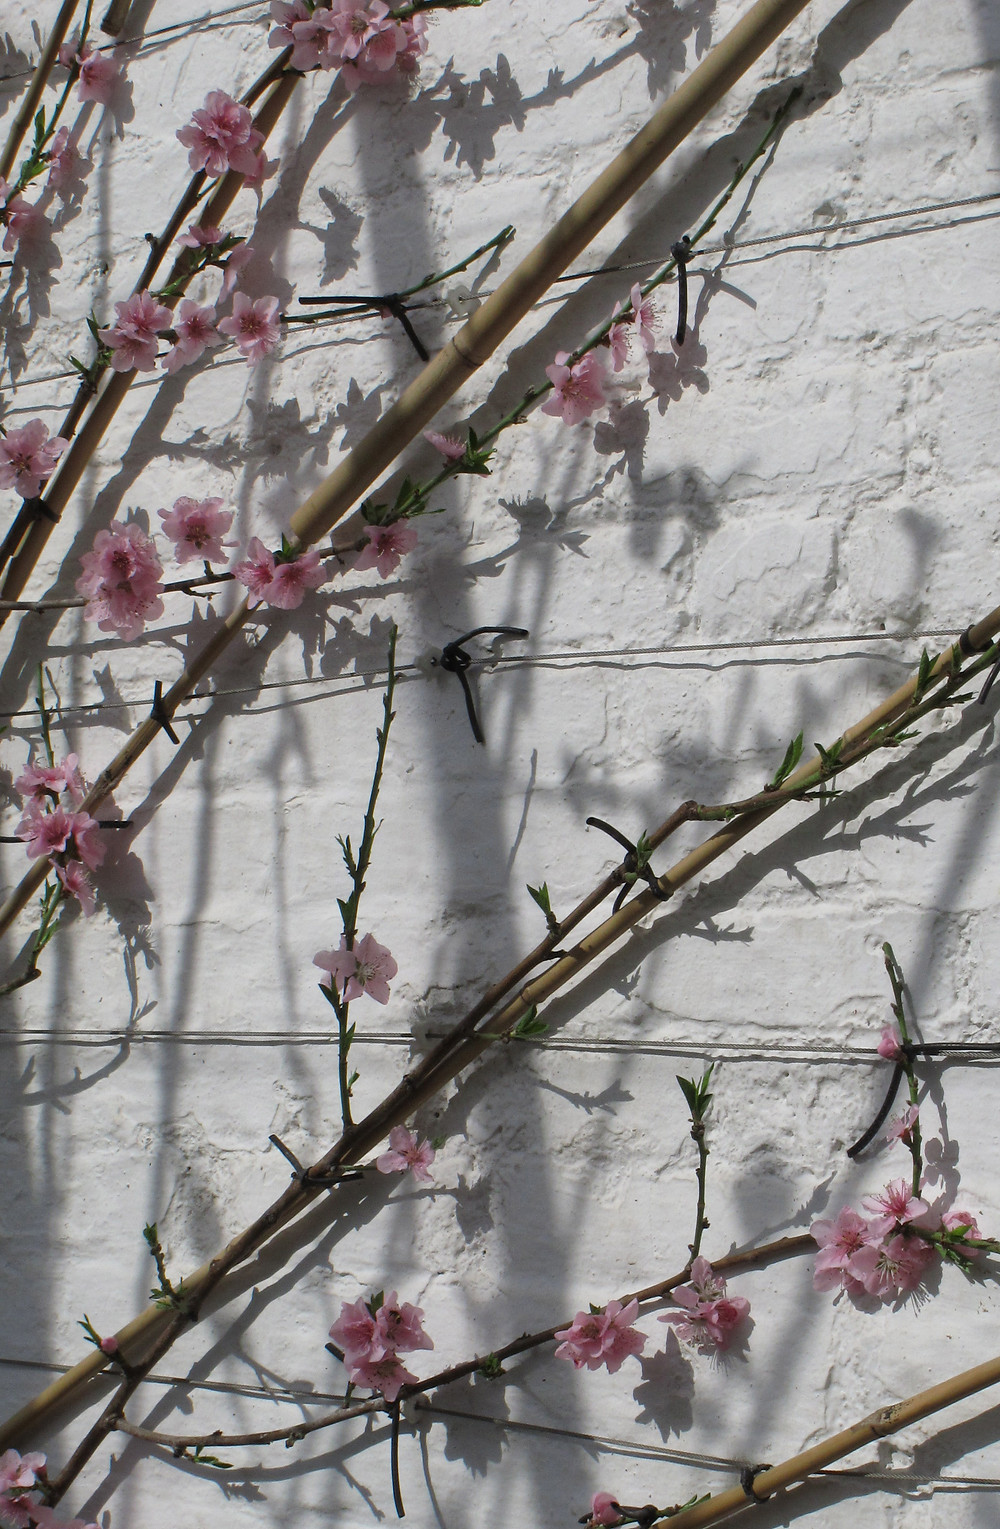 cherry blossom, fan trained fruit tree,